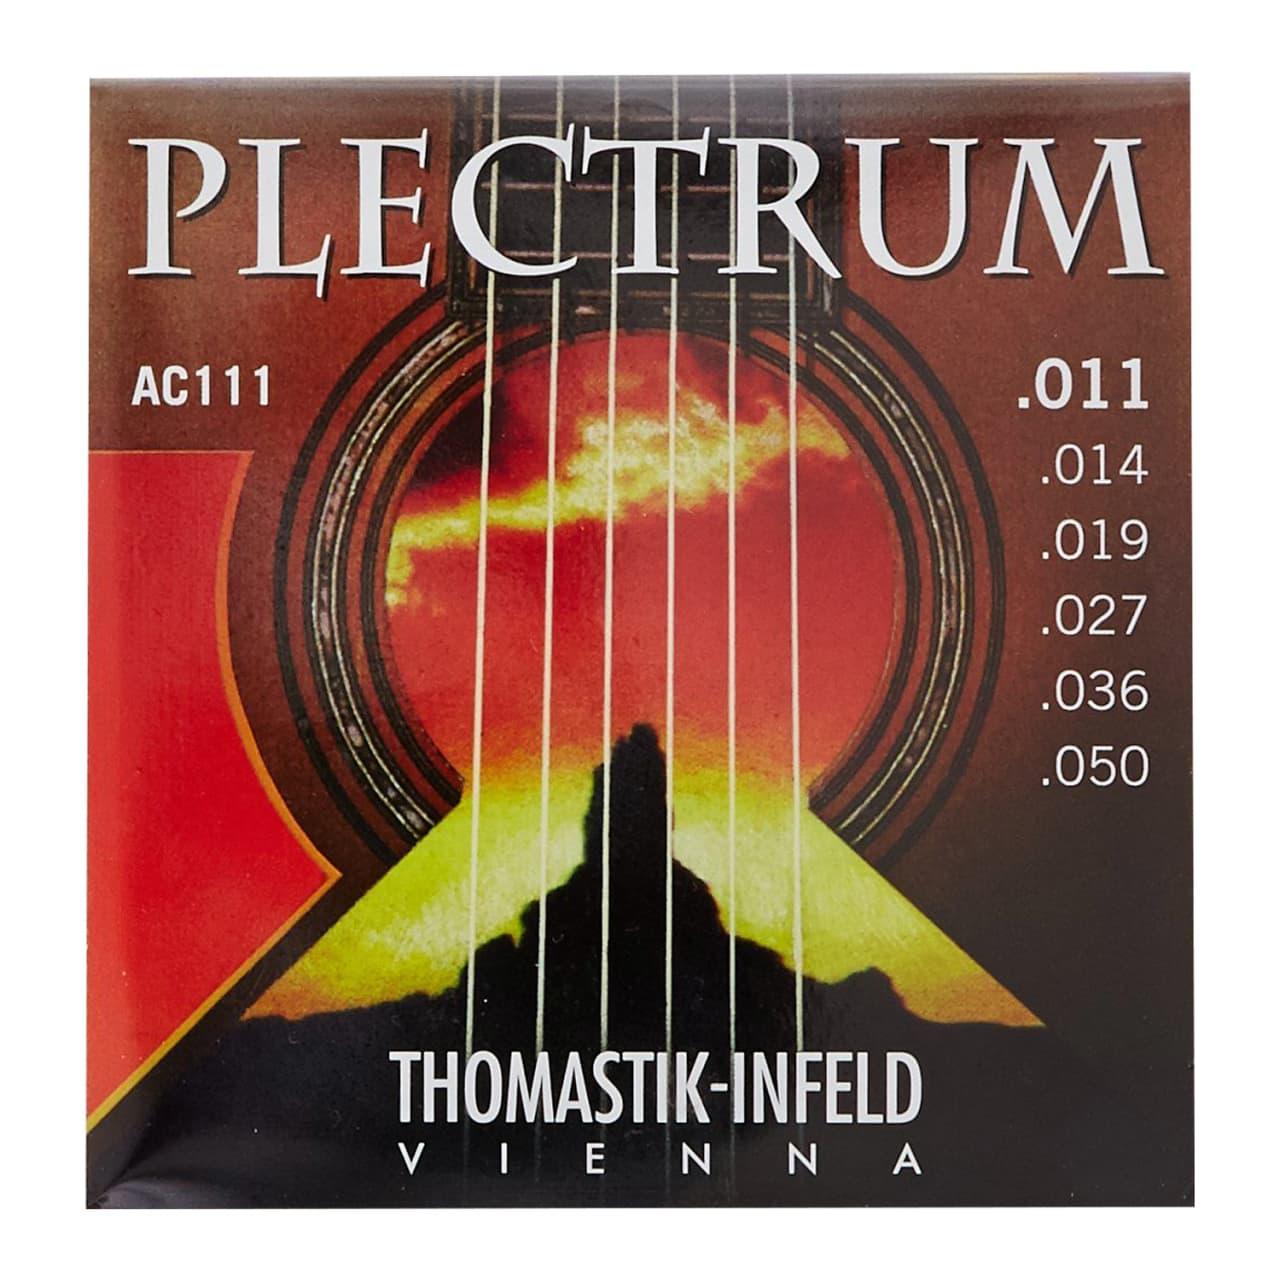 thomastik infeld ac111 acoustic guitar strings plectrum reverb. Black Bedroom Furniture Sets. Home Design Ideas